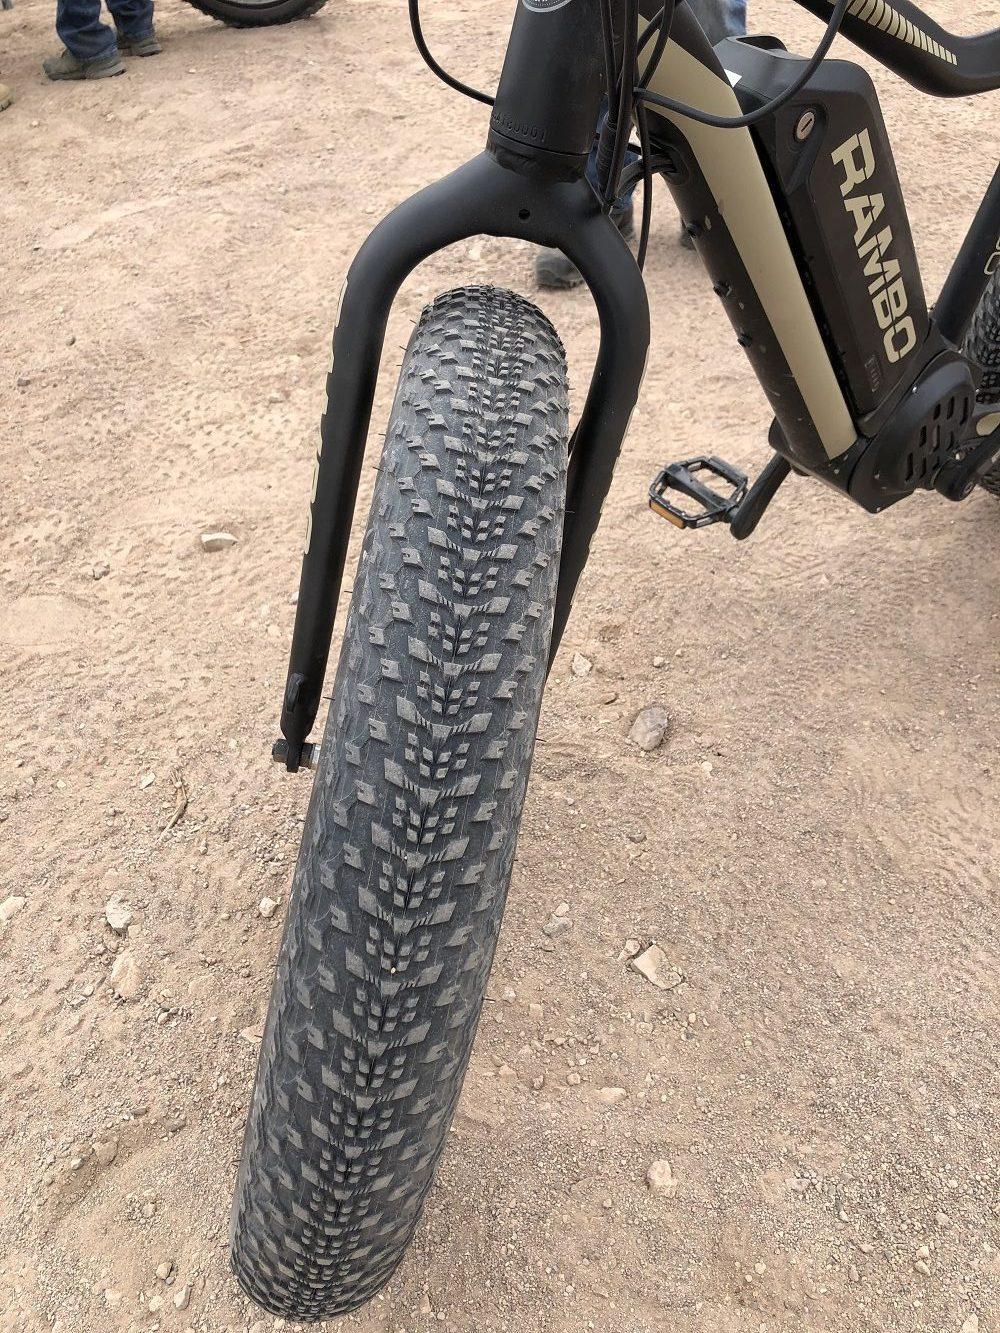 Rambo Fat Tire